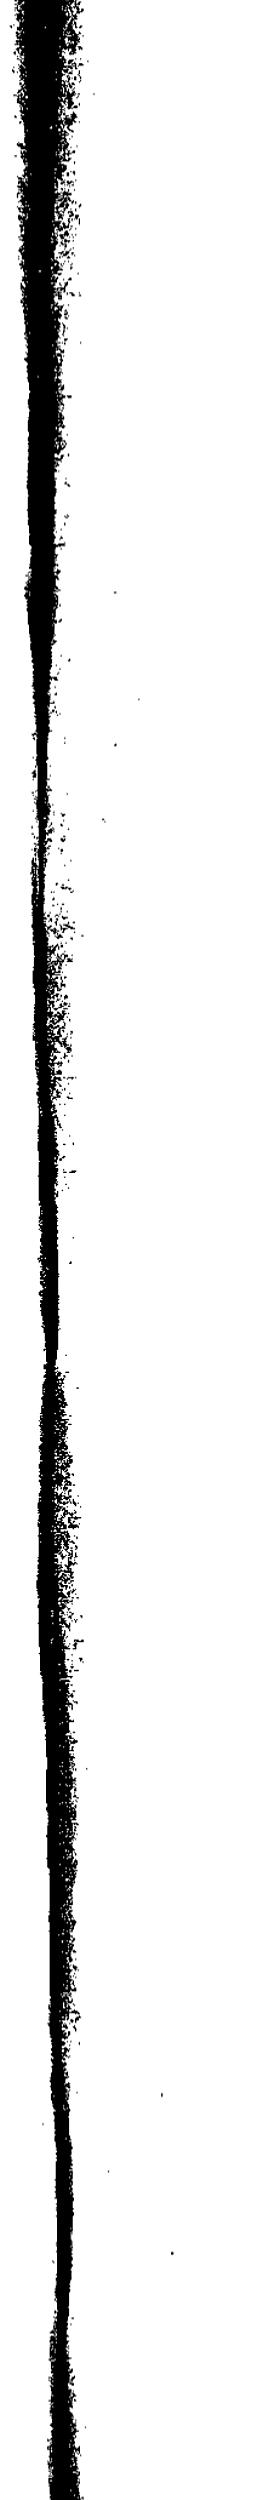 [graphic][graphic][graphic][graphic][graphic][graphic][graphic][graphic][graphic][graphic][graphic][graphic][graphic][graphic][graphic][graphic][graphic][graphic][graphic][graphic][graphic][graphic]